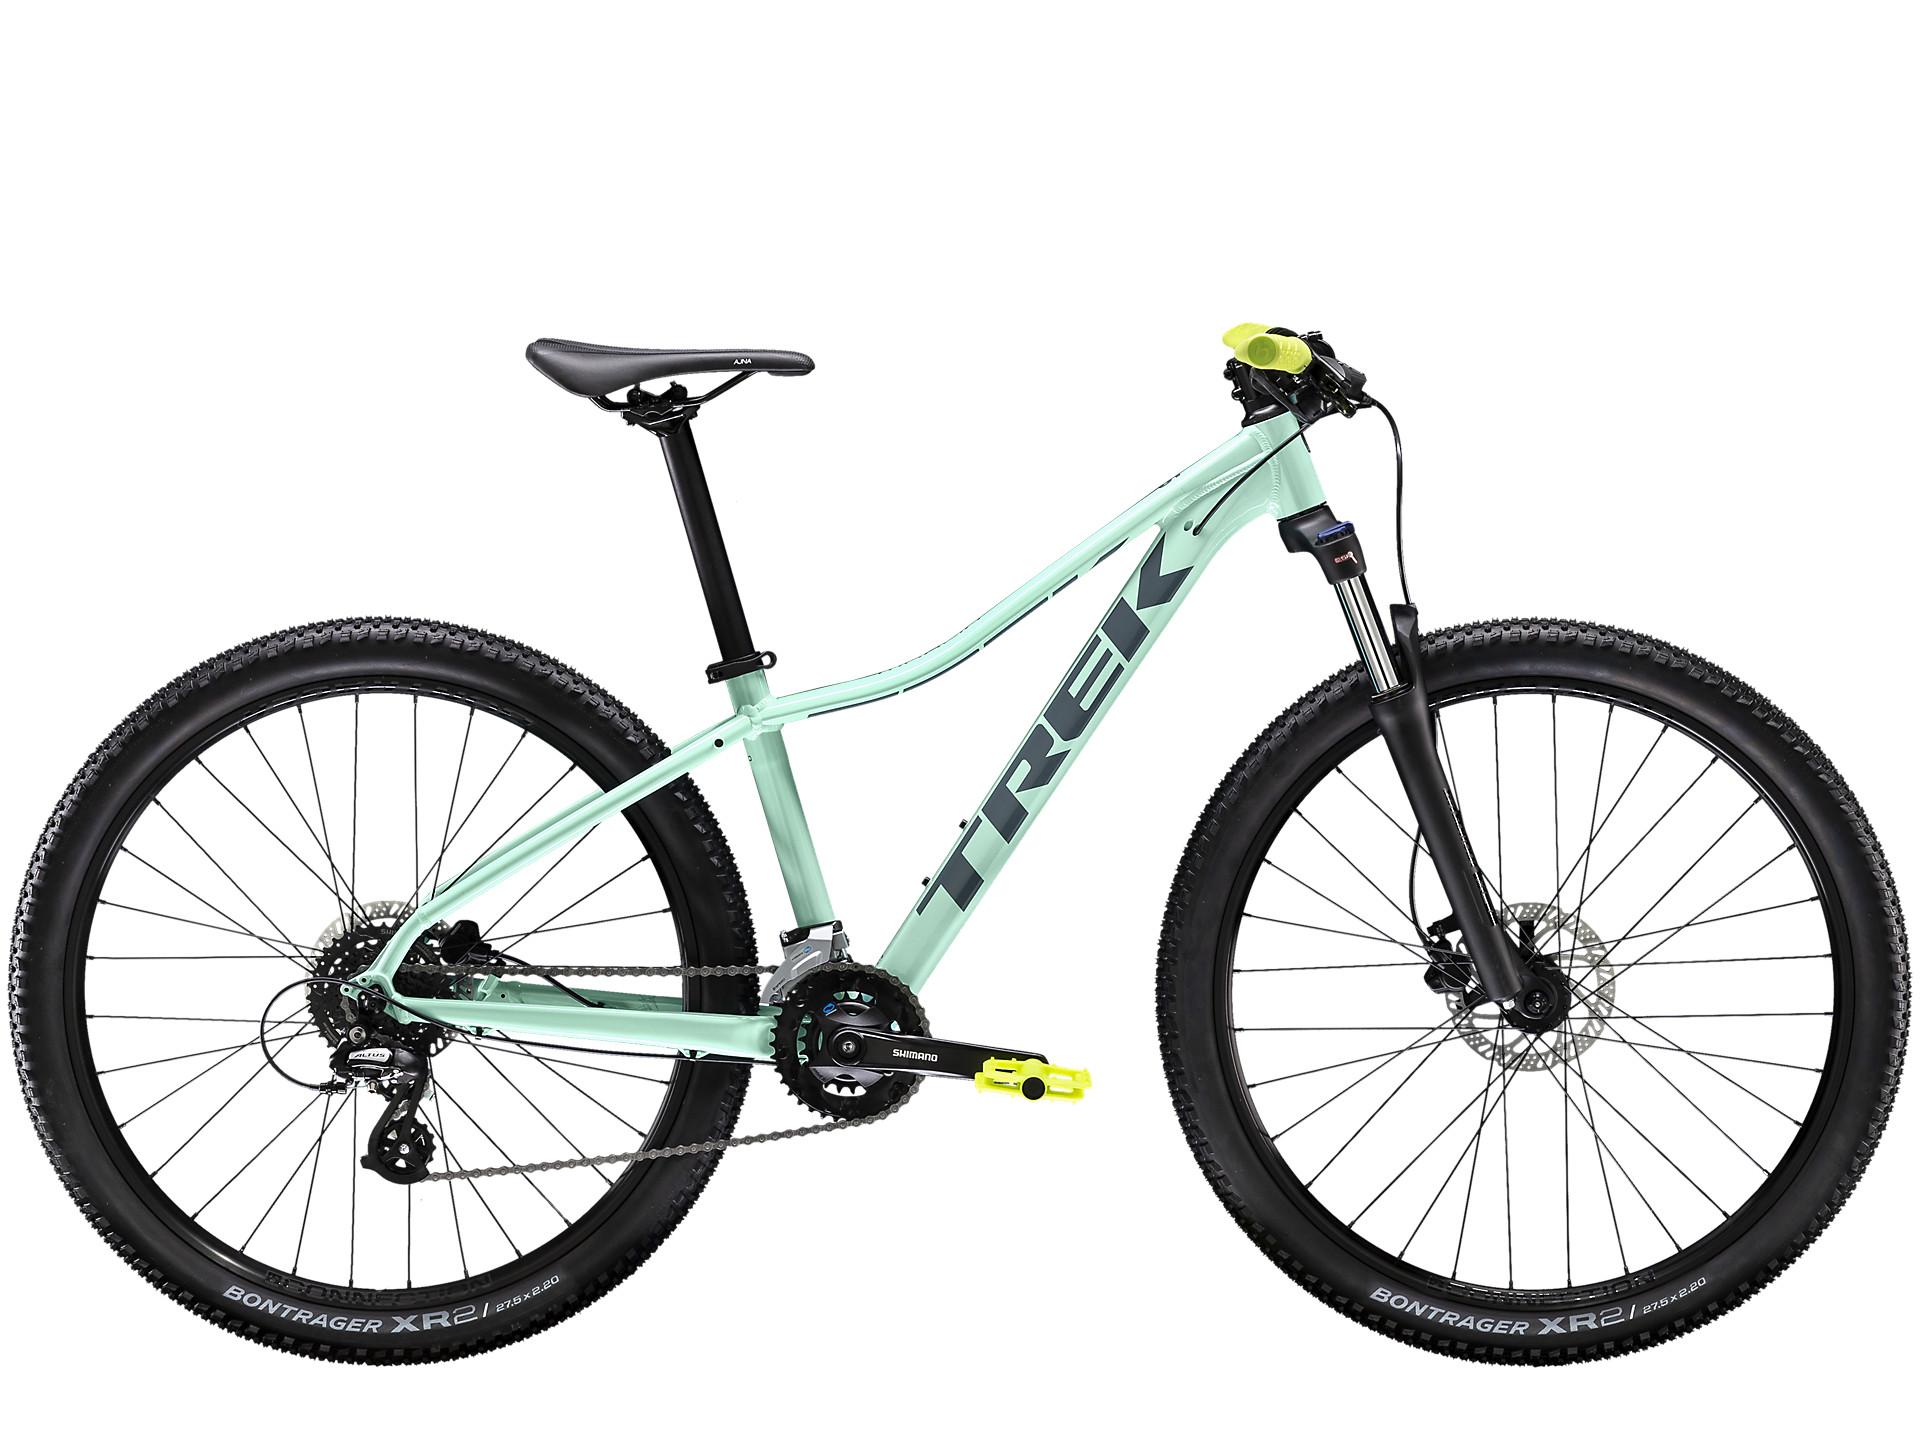 Marlin   Trek Bikes